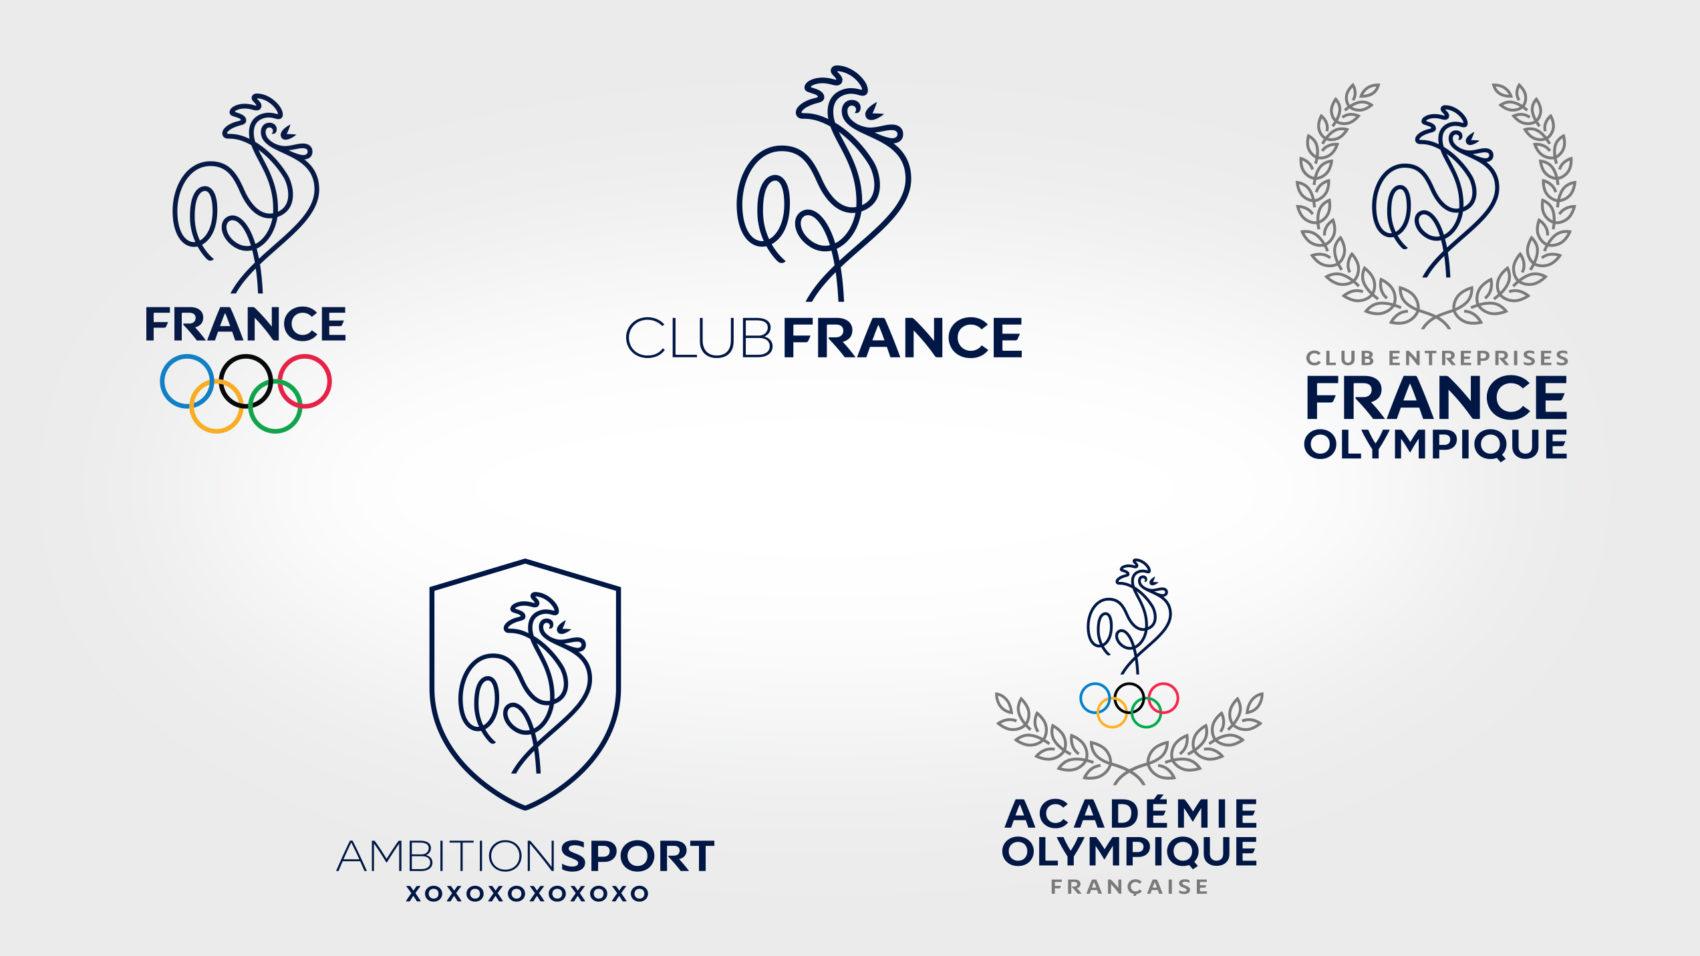 Projet_project_realisation_CNOSF_comite_national_olympique_et_sportif_francais_3